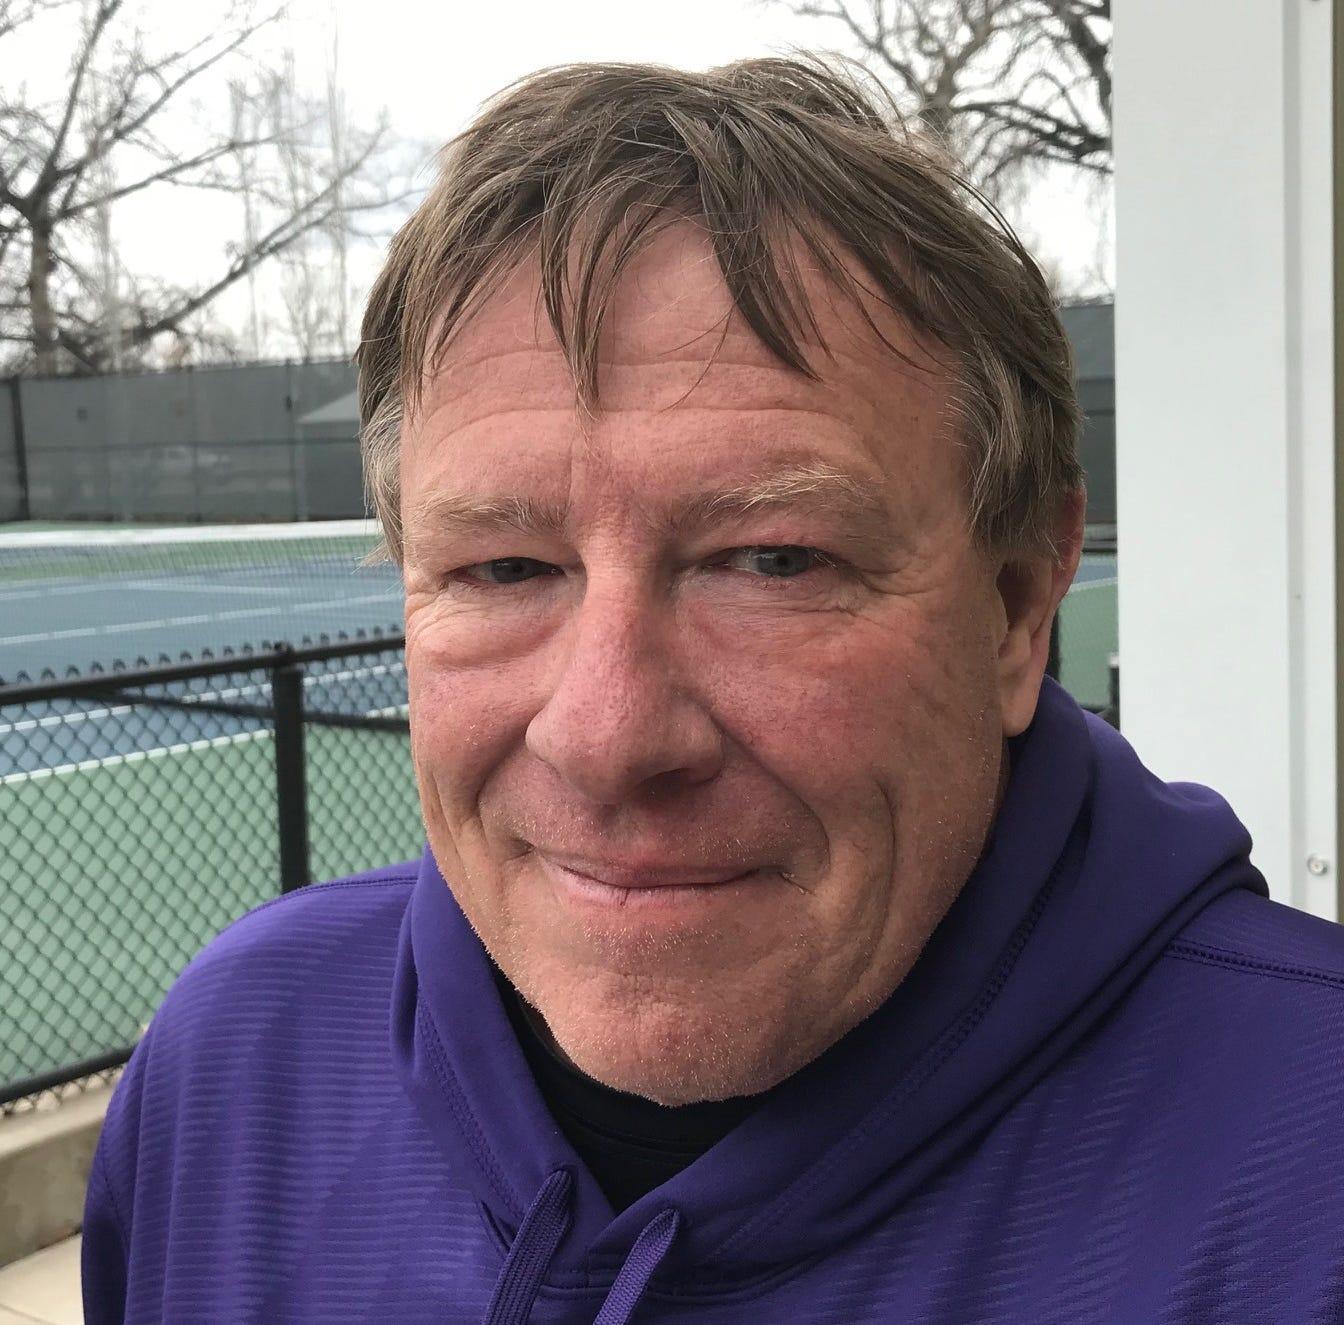 No matter where he's coaching, Schilling bleeds purple and gold